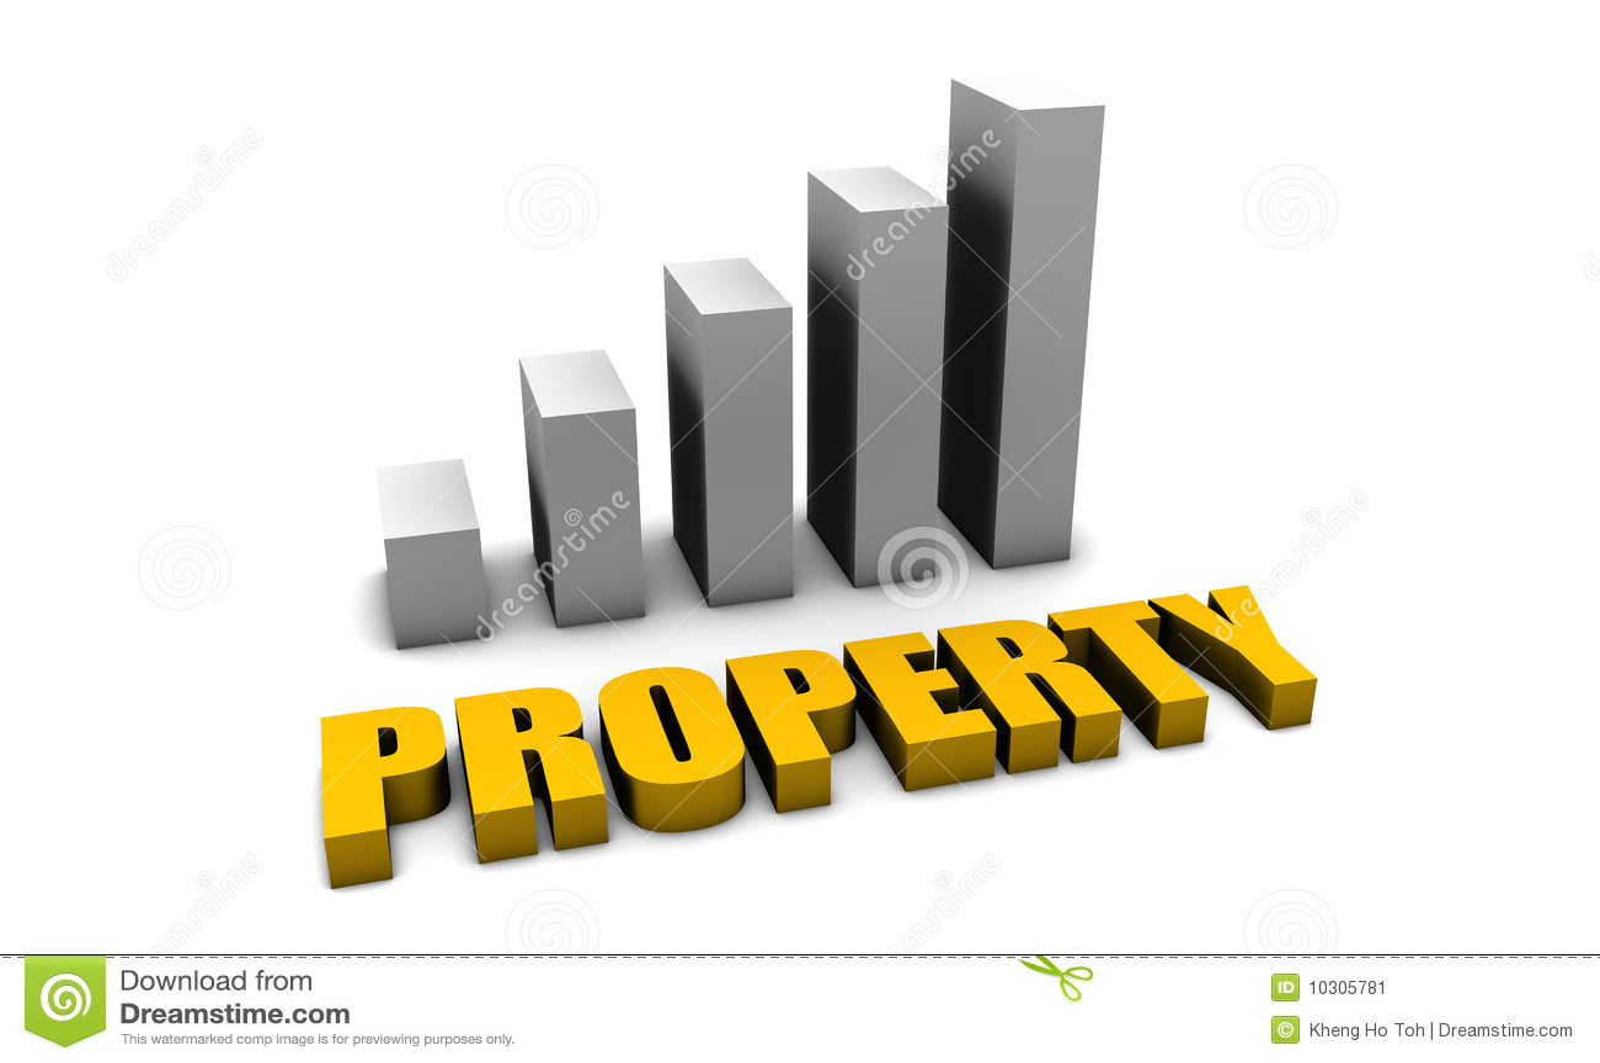 Eigentum